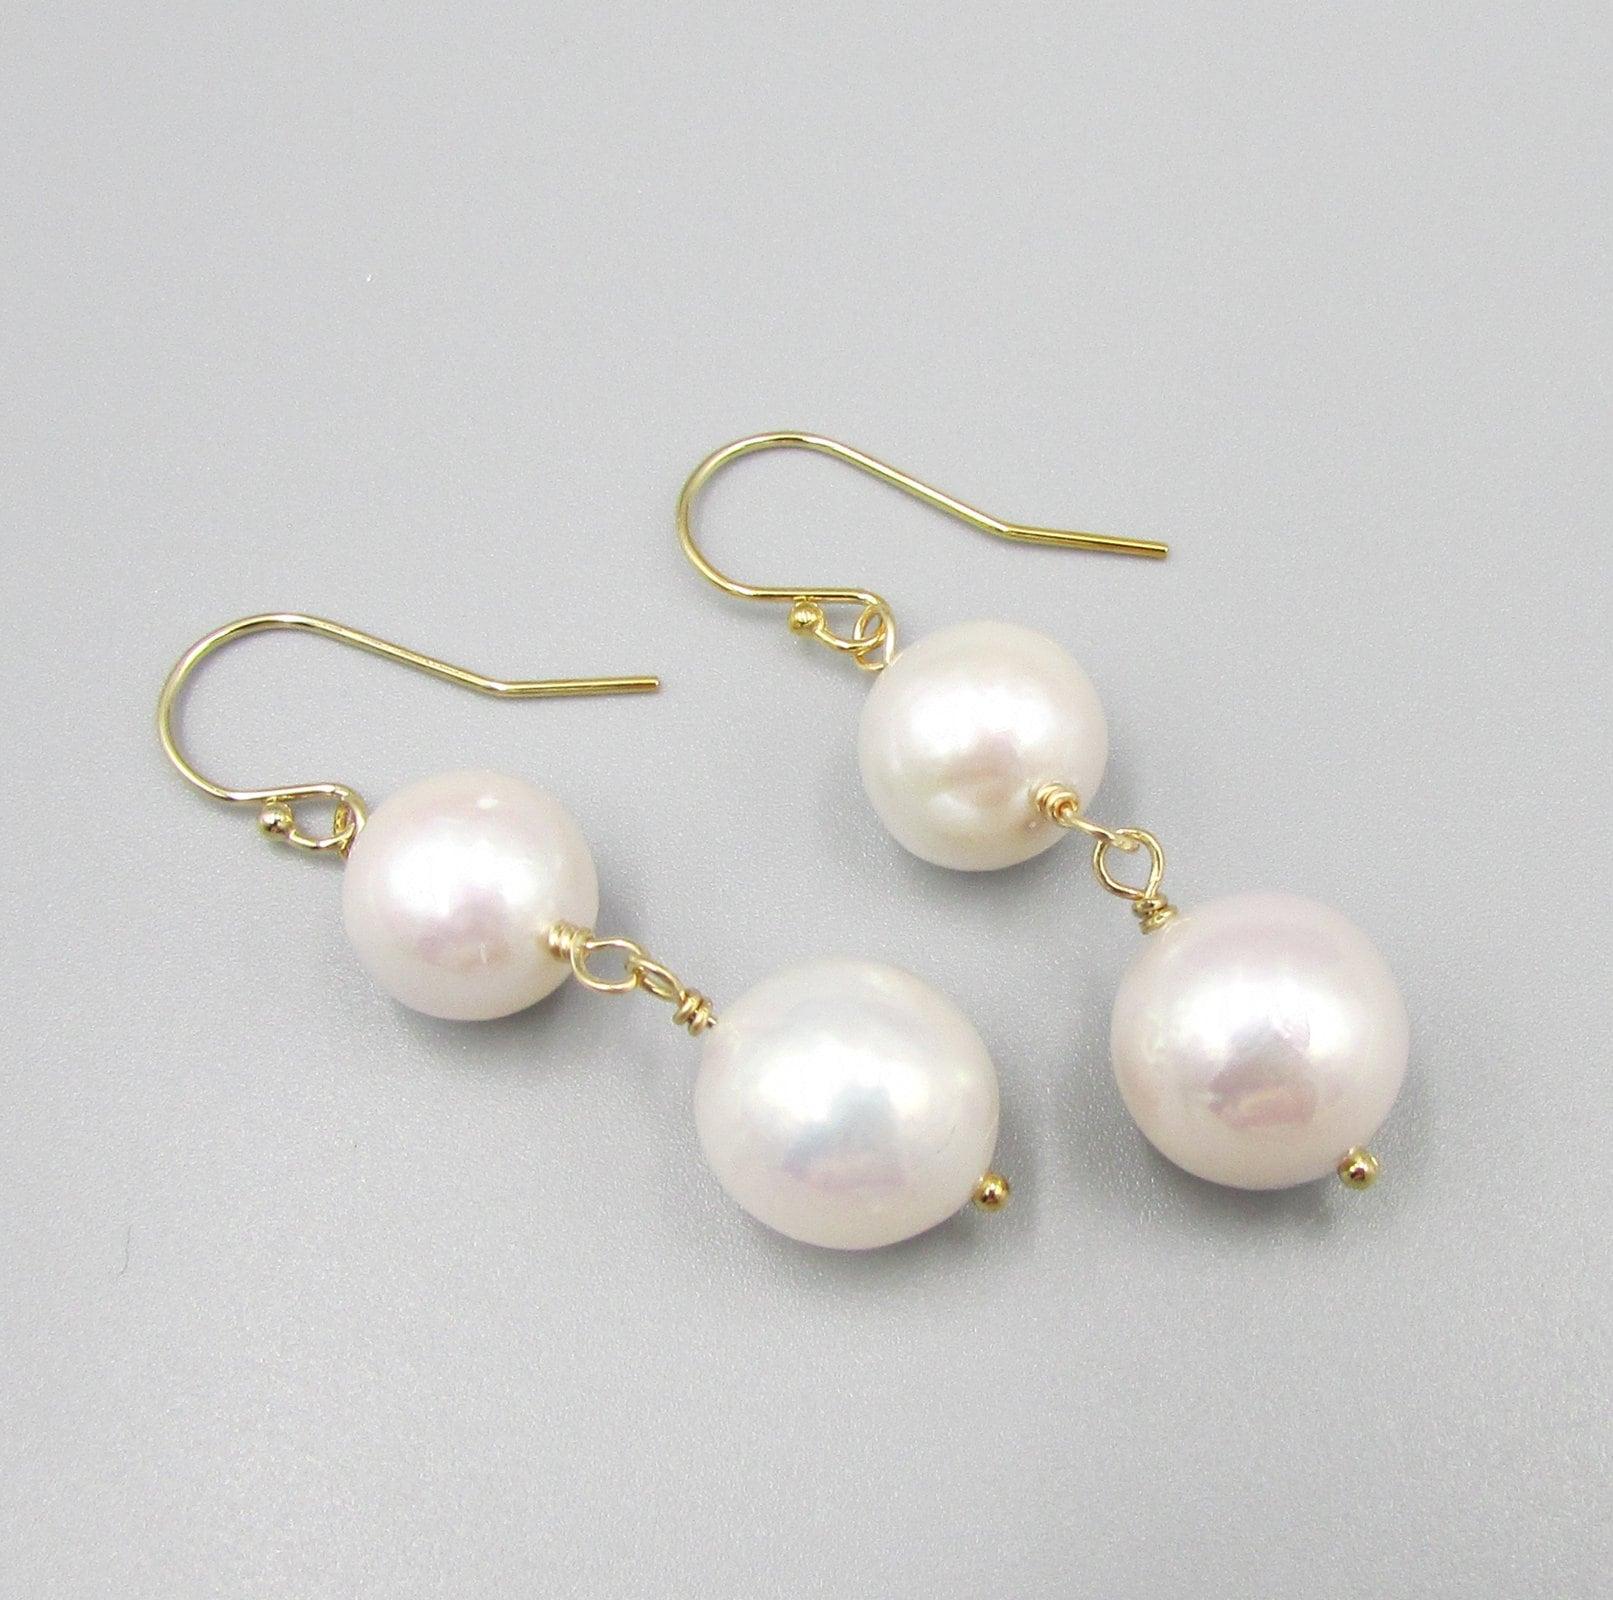 c79cea4bfddc0 White Long Pearl Earrings   Long Pearl Dangles   Classic Pearls ...